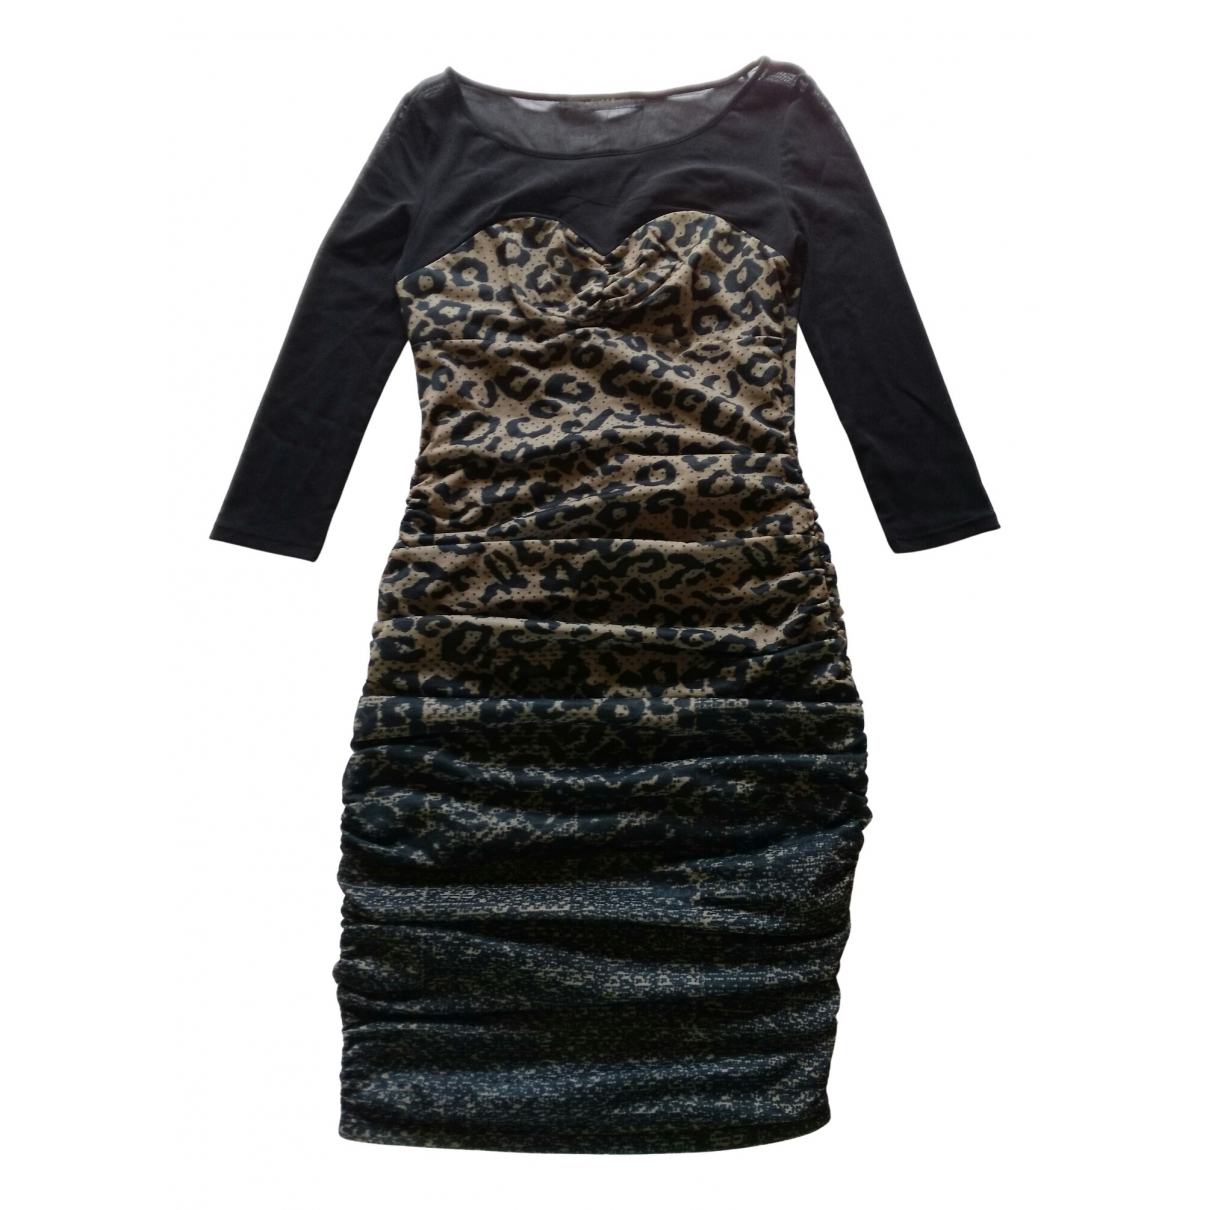 Guess \N Kleid in  Schwarz Polyester